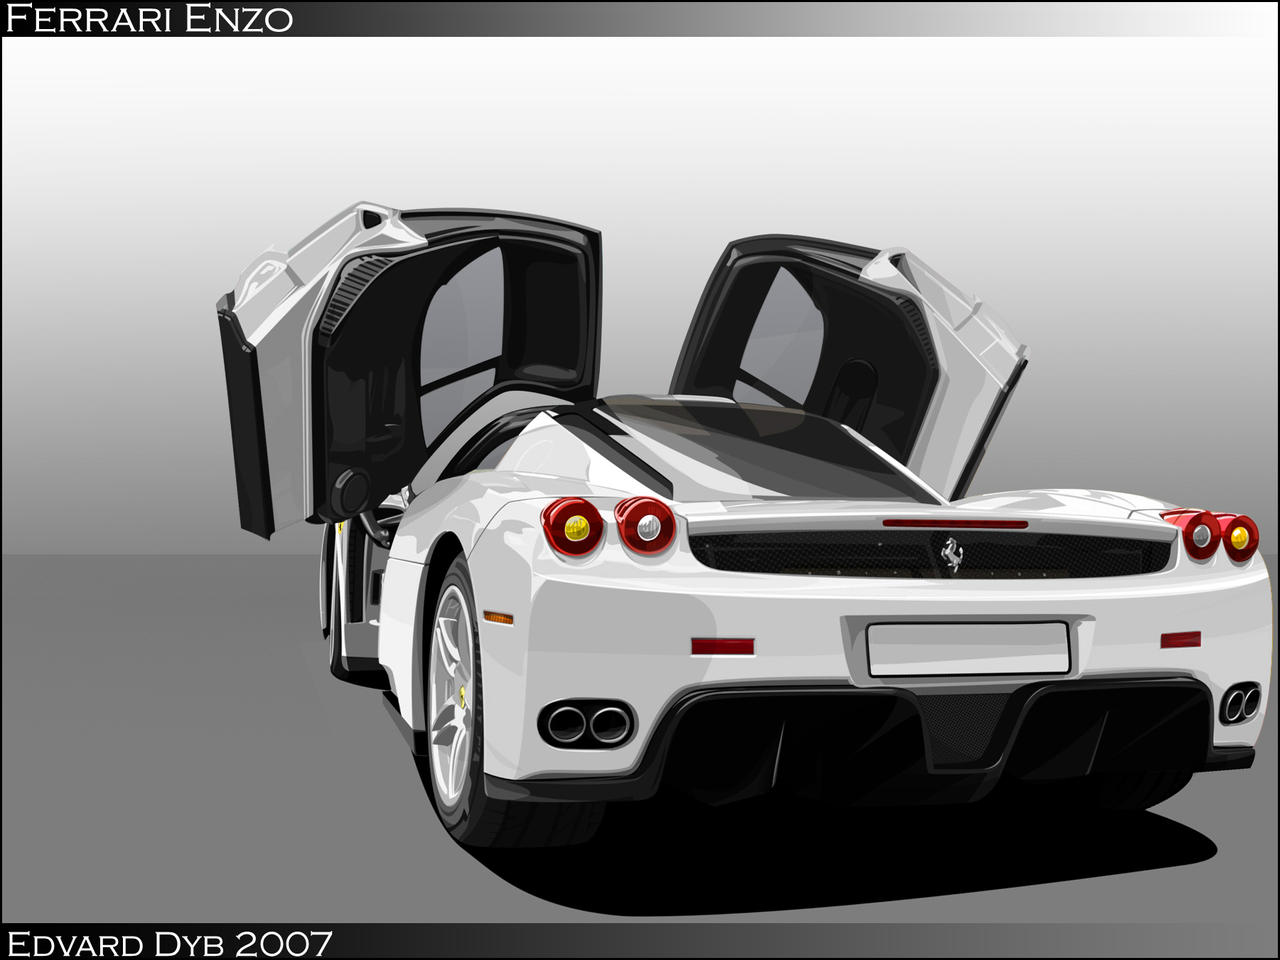 Ferrari enzo by dr phoenix on deviantart ferrari enzo by dr phoenix vanachro Image collections